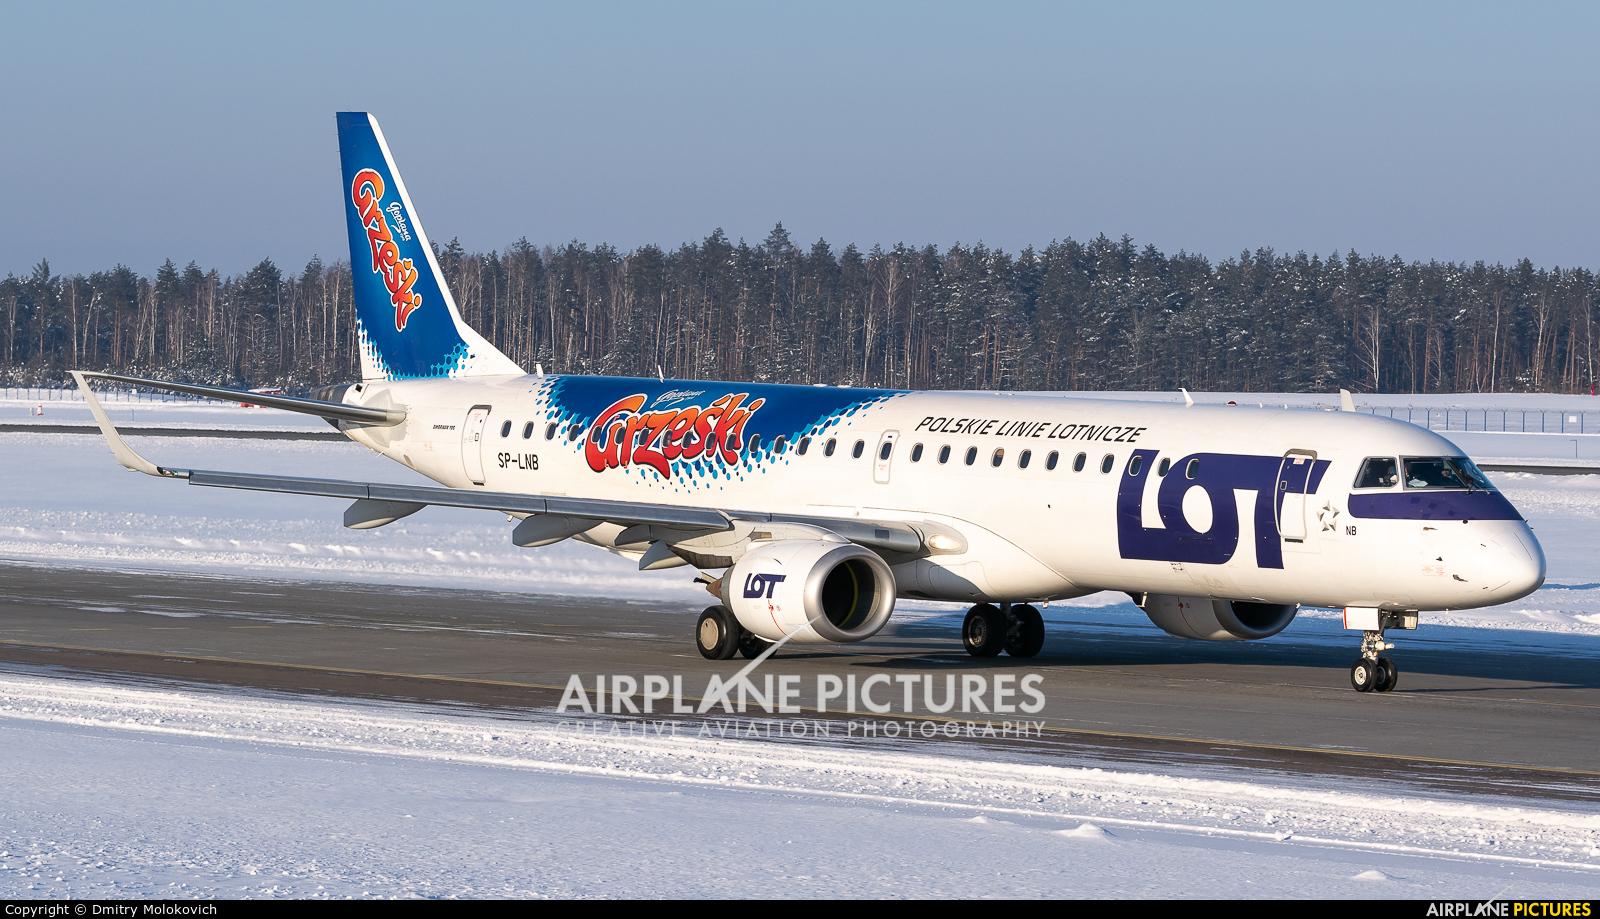 LOT - Polish Airlines SP-LNB aircraft at Minsk Intl